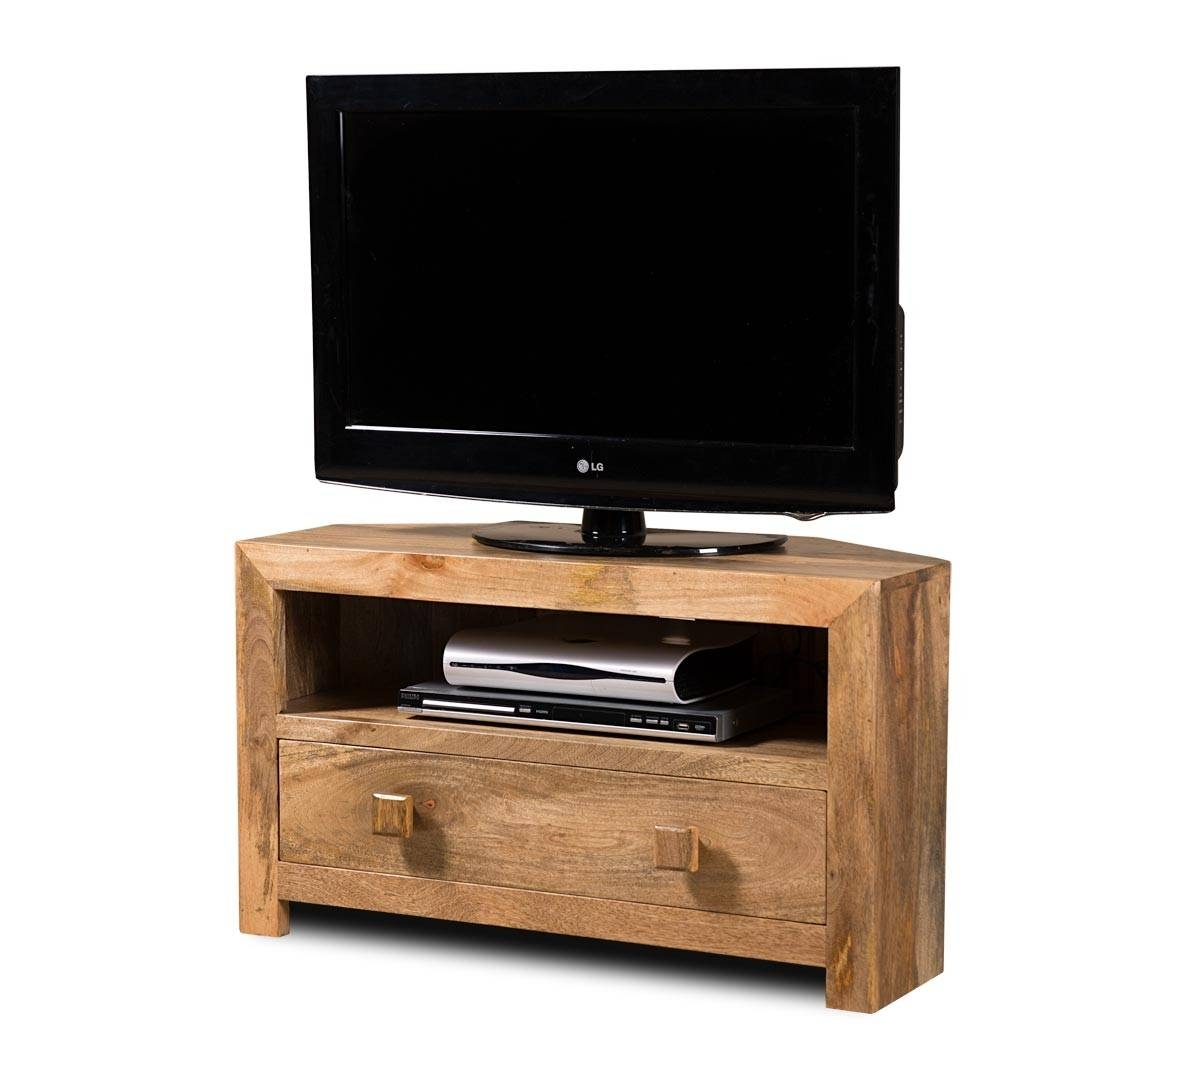 Dakota Light Mango Small Corner Tv Stand | Casa Bella Furniture Uk Intended For Wood Corner Tv Cabinets (View 5 of 15)